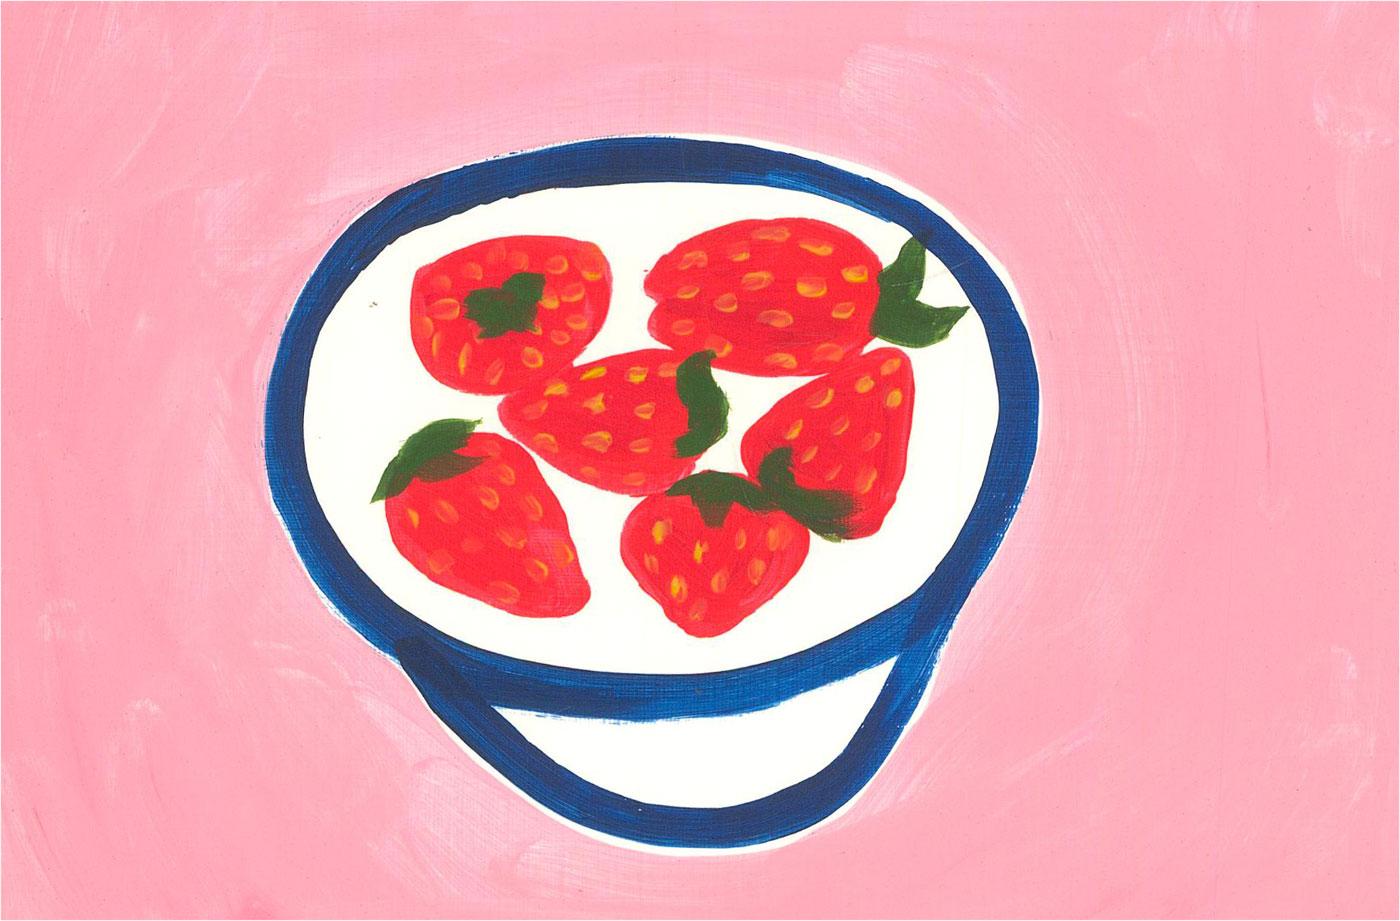 Sian Roberts - 2021 Acrylic, Strawberries